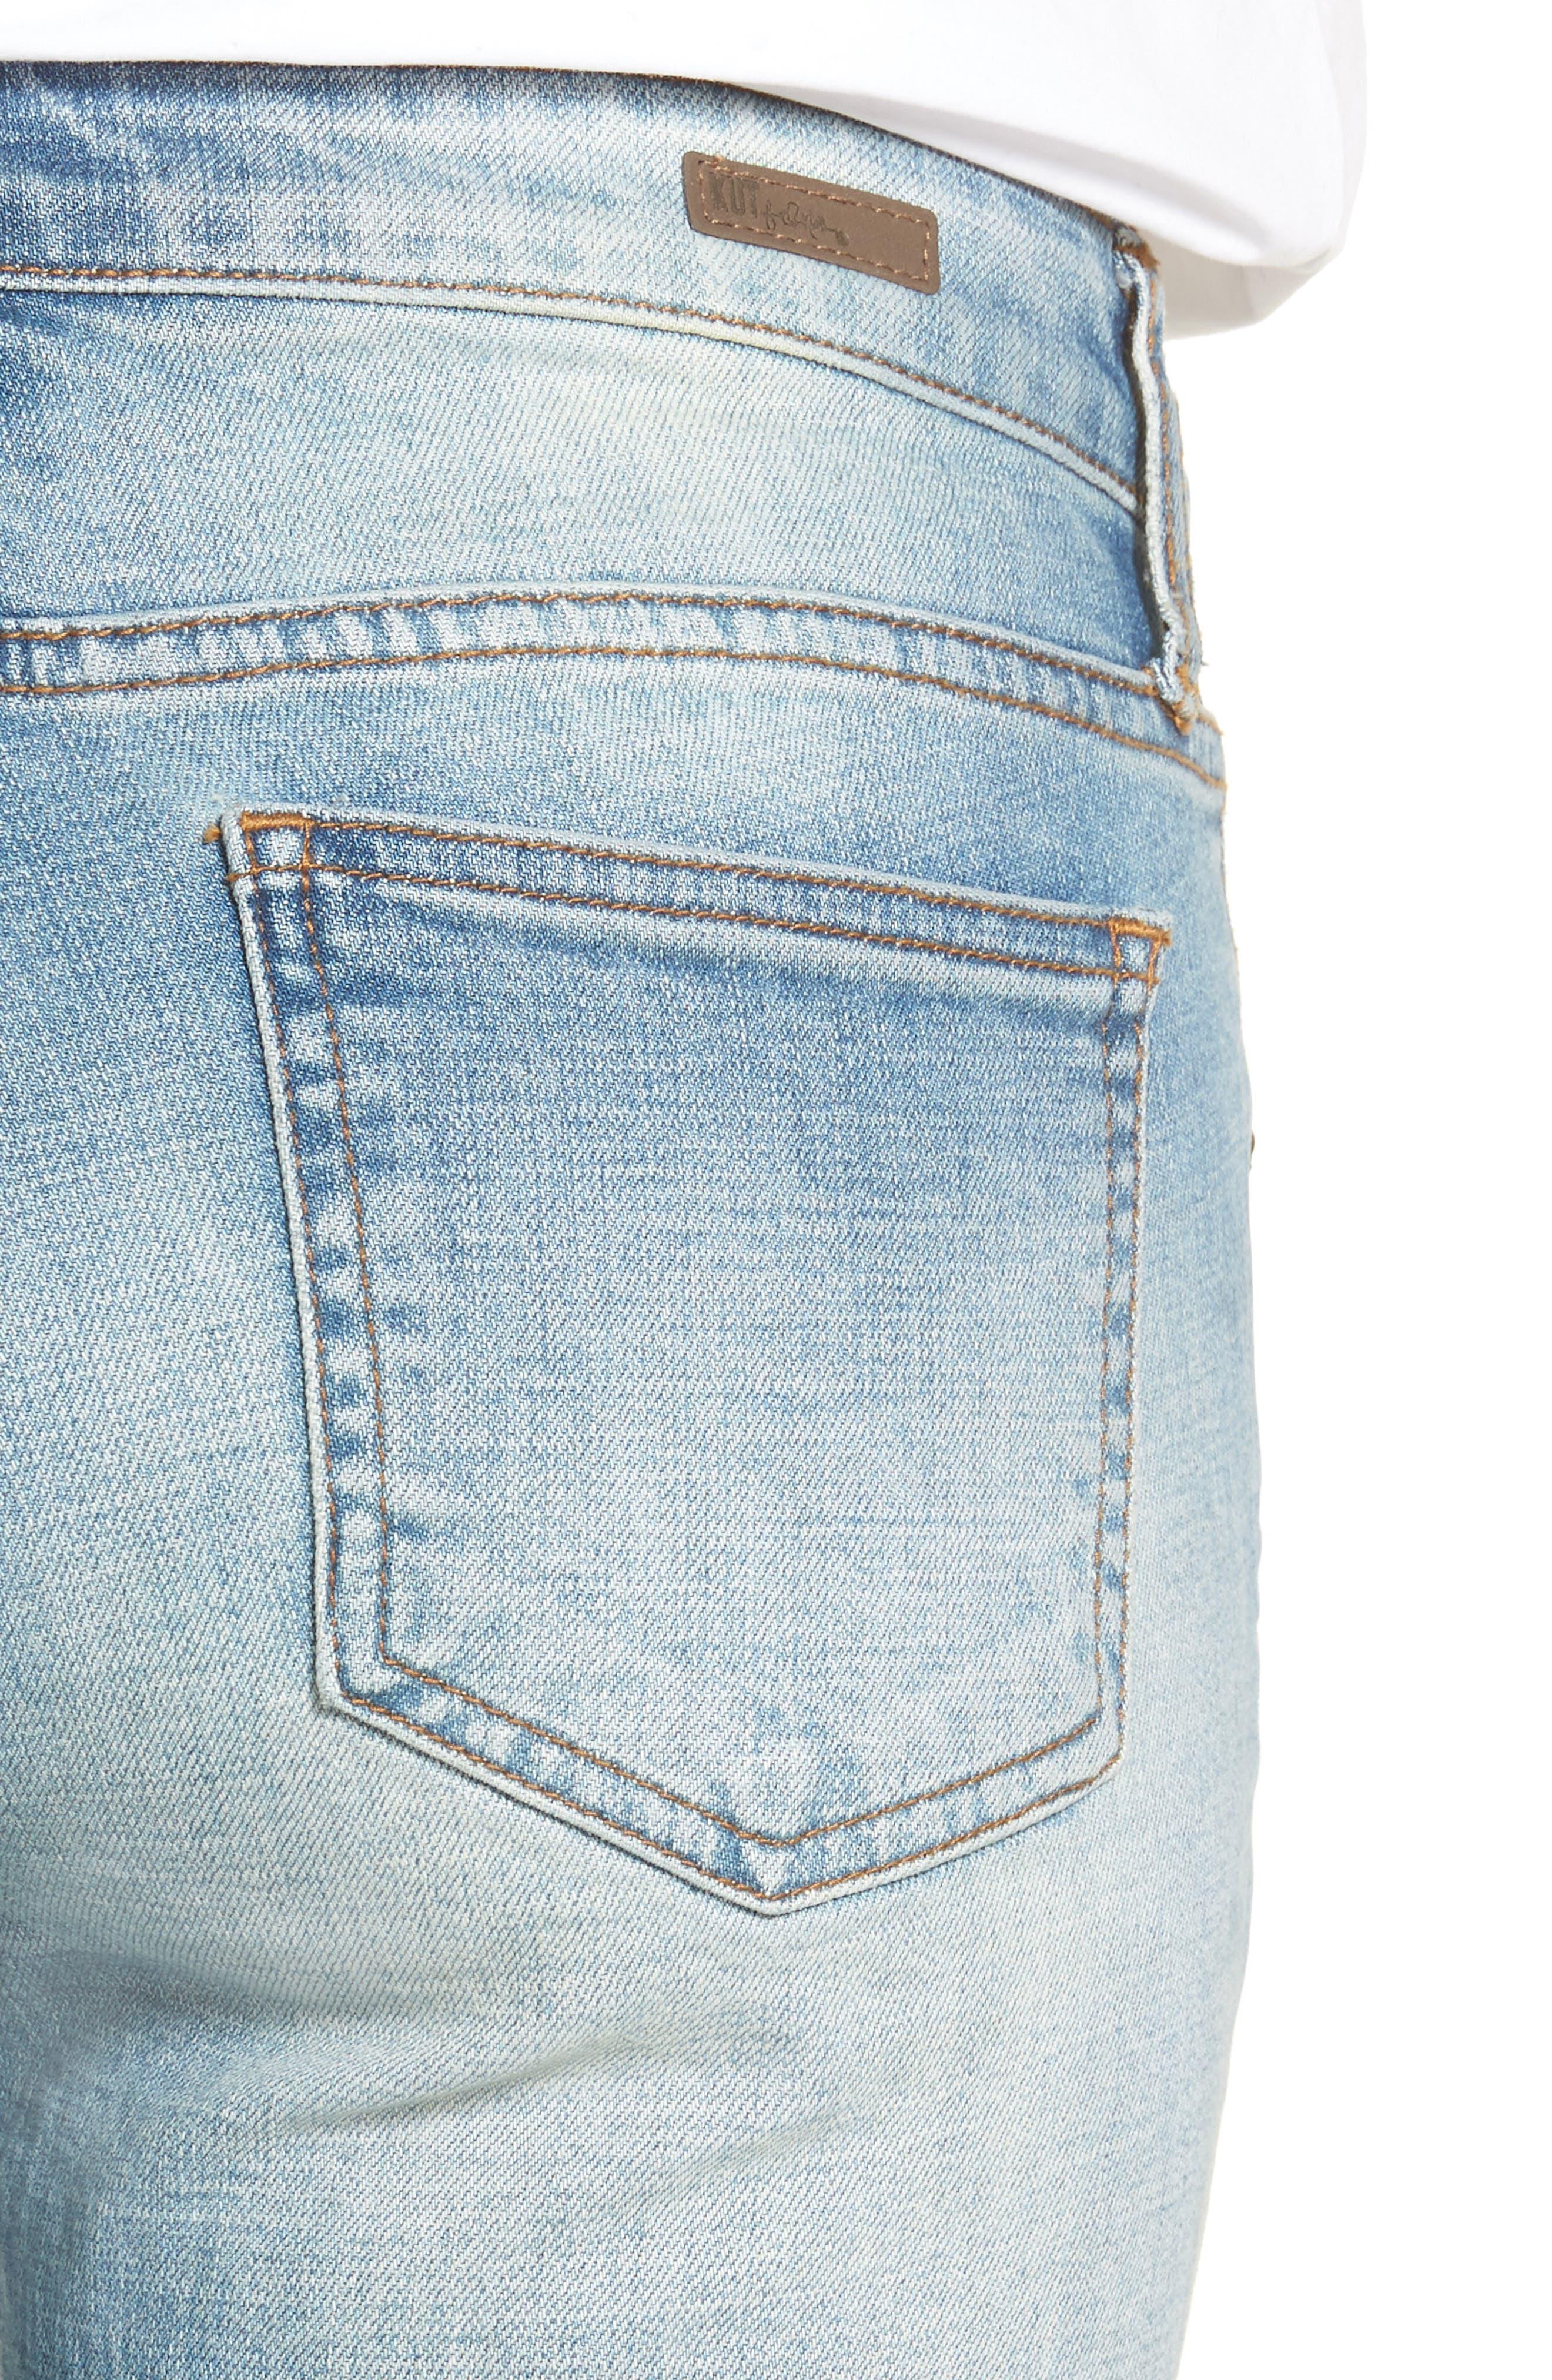 Catherine Boyfriend Jeans,                             Alternate thumbnail 4, color,                             481